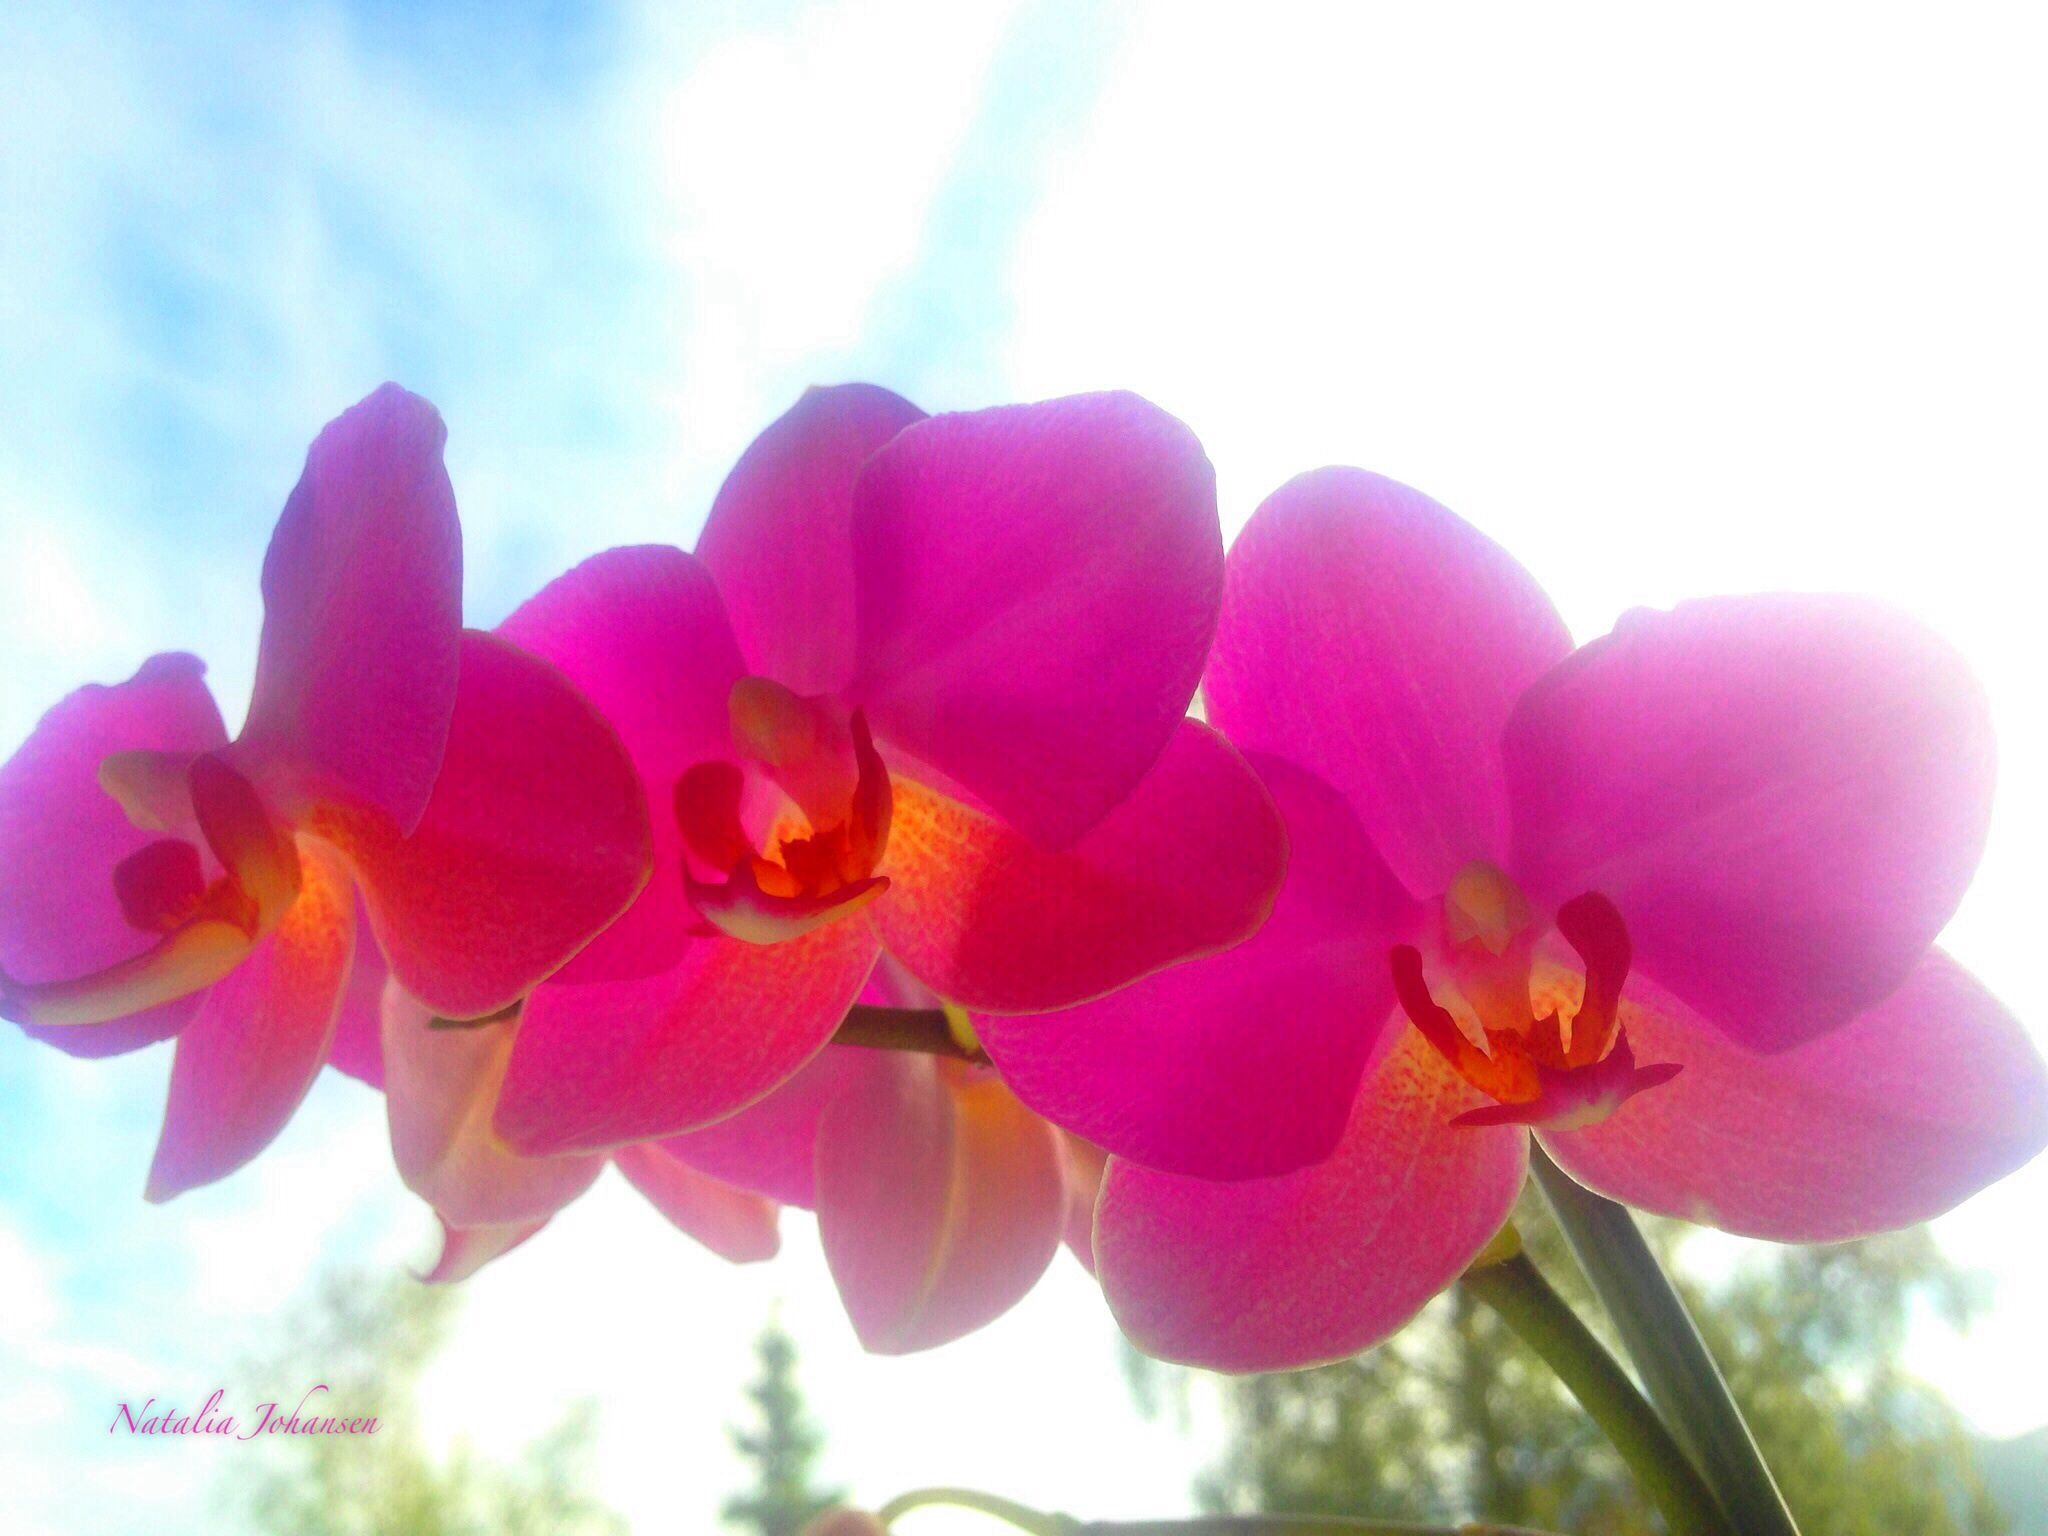 Flowers by natalia.johansen.92